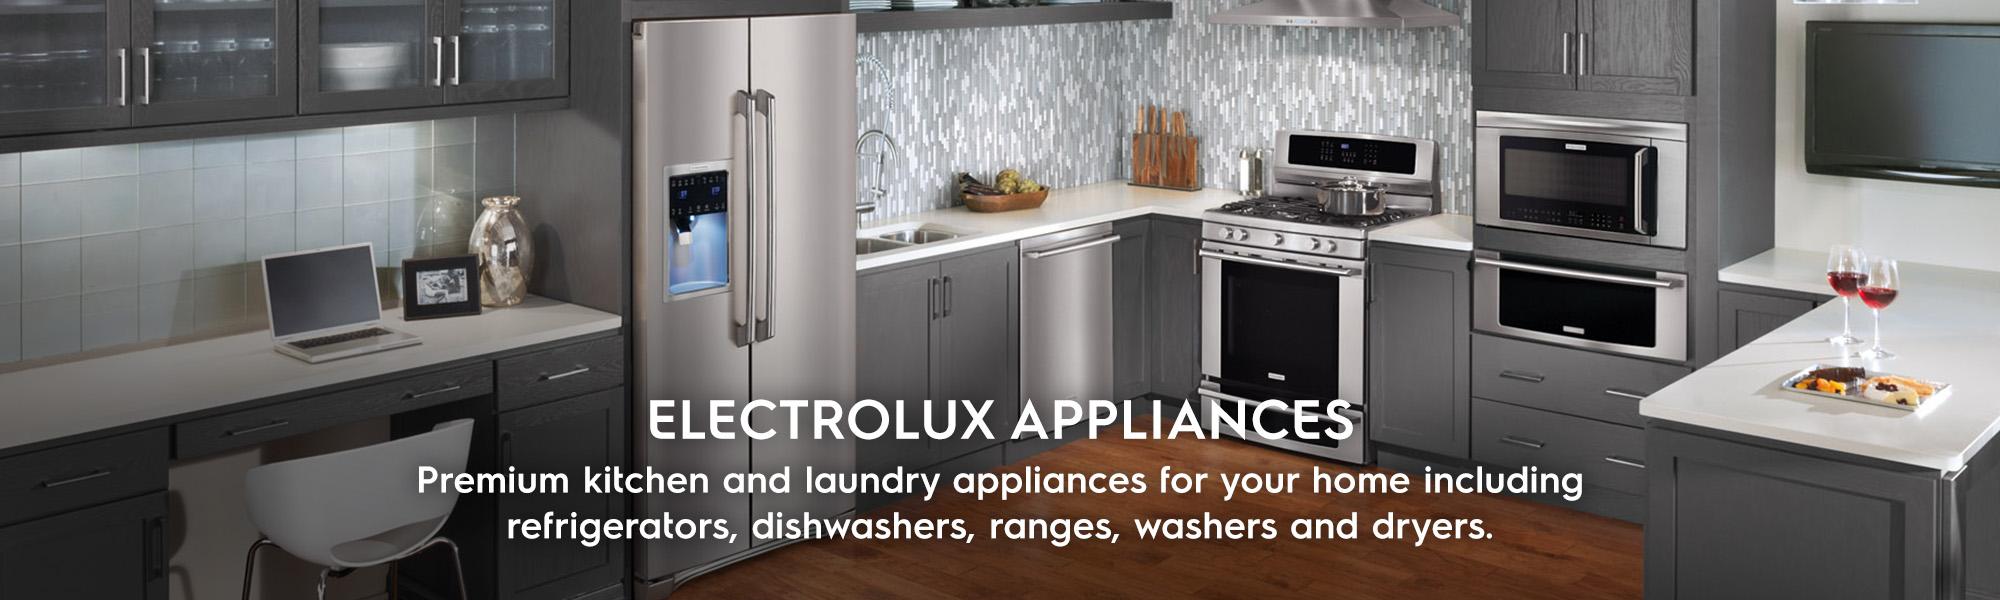 Uncategorized Electrolux Kitchen Appliances electrolux appliances mattresses and televisions in appliances